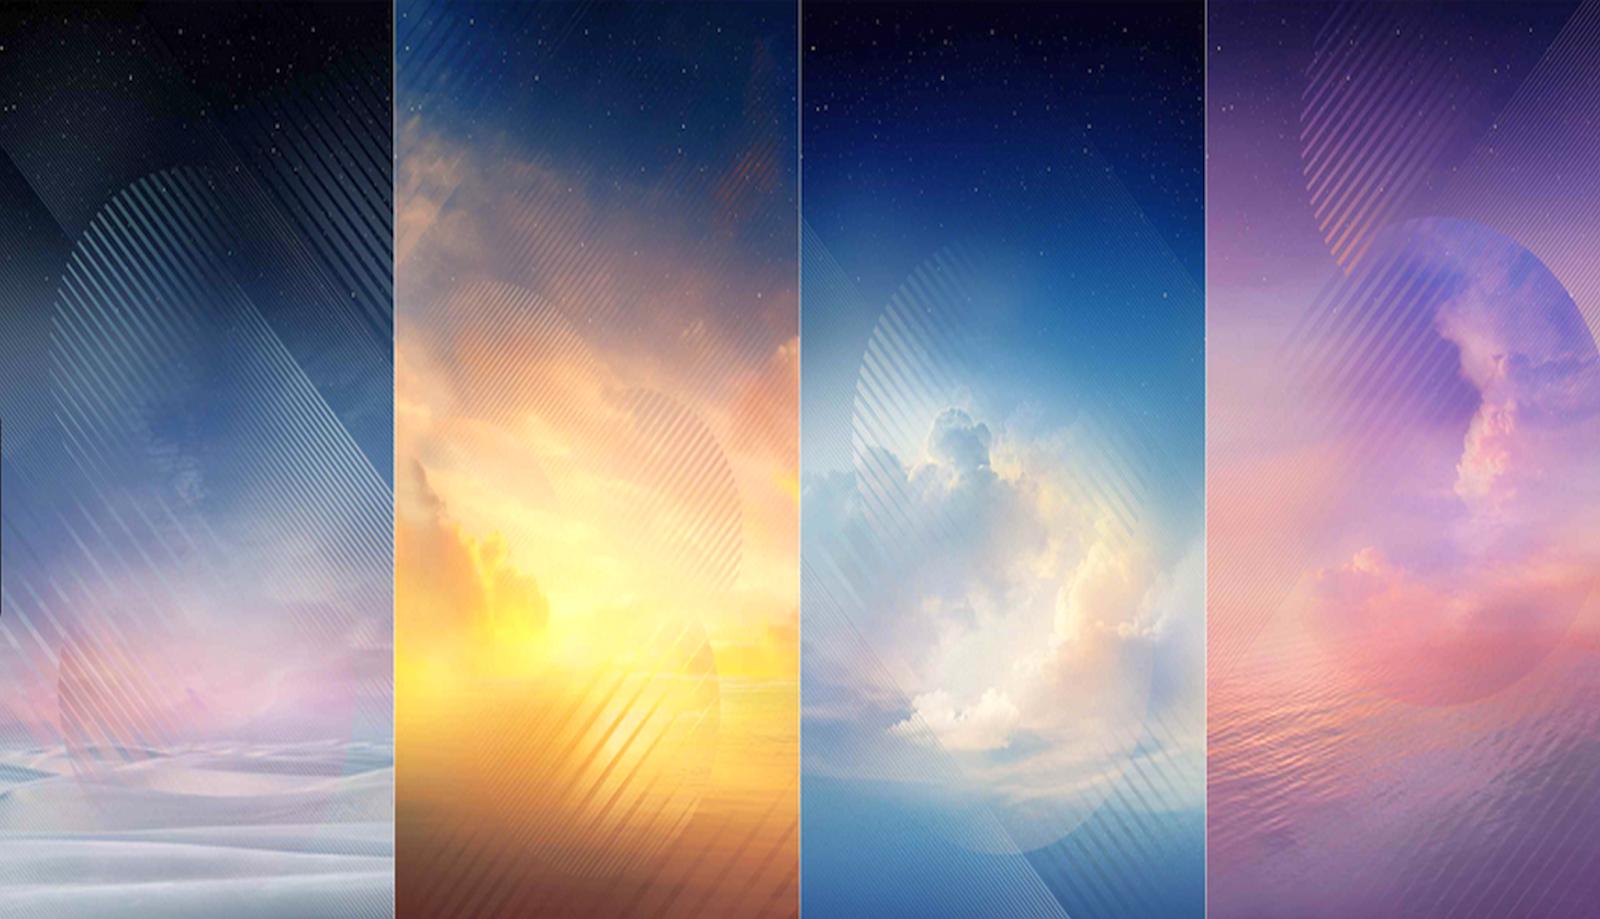 9 Image Galaxy Note 9 Wallpaper